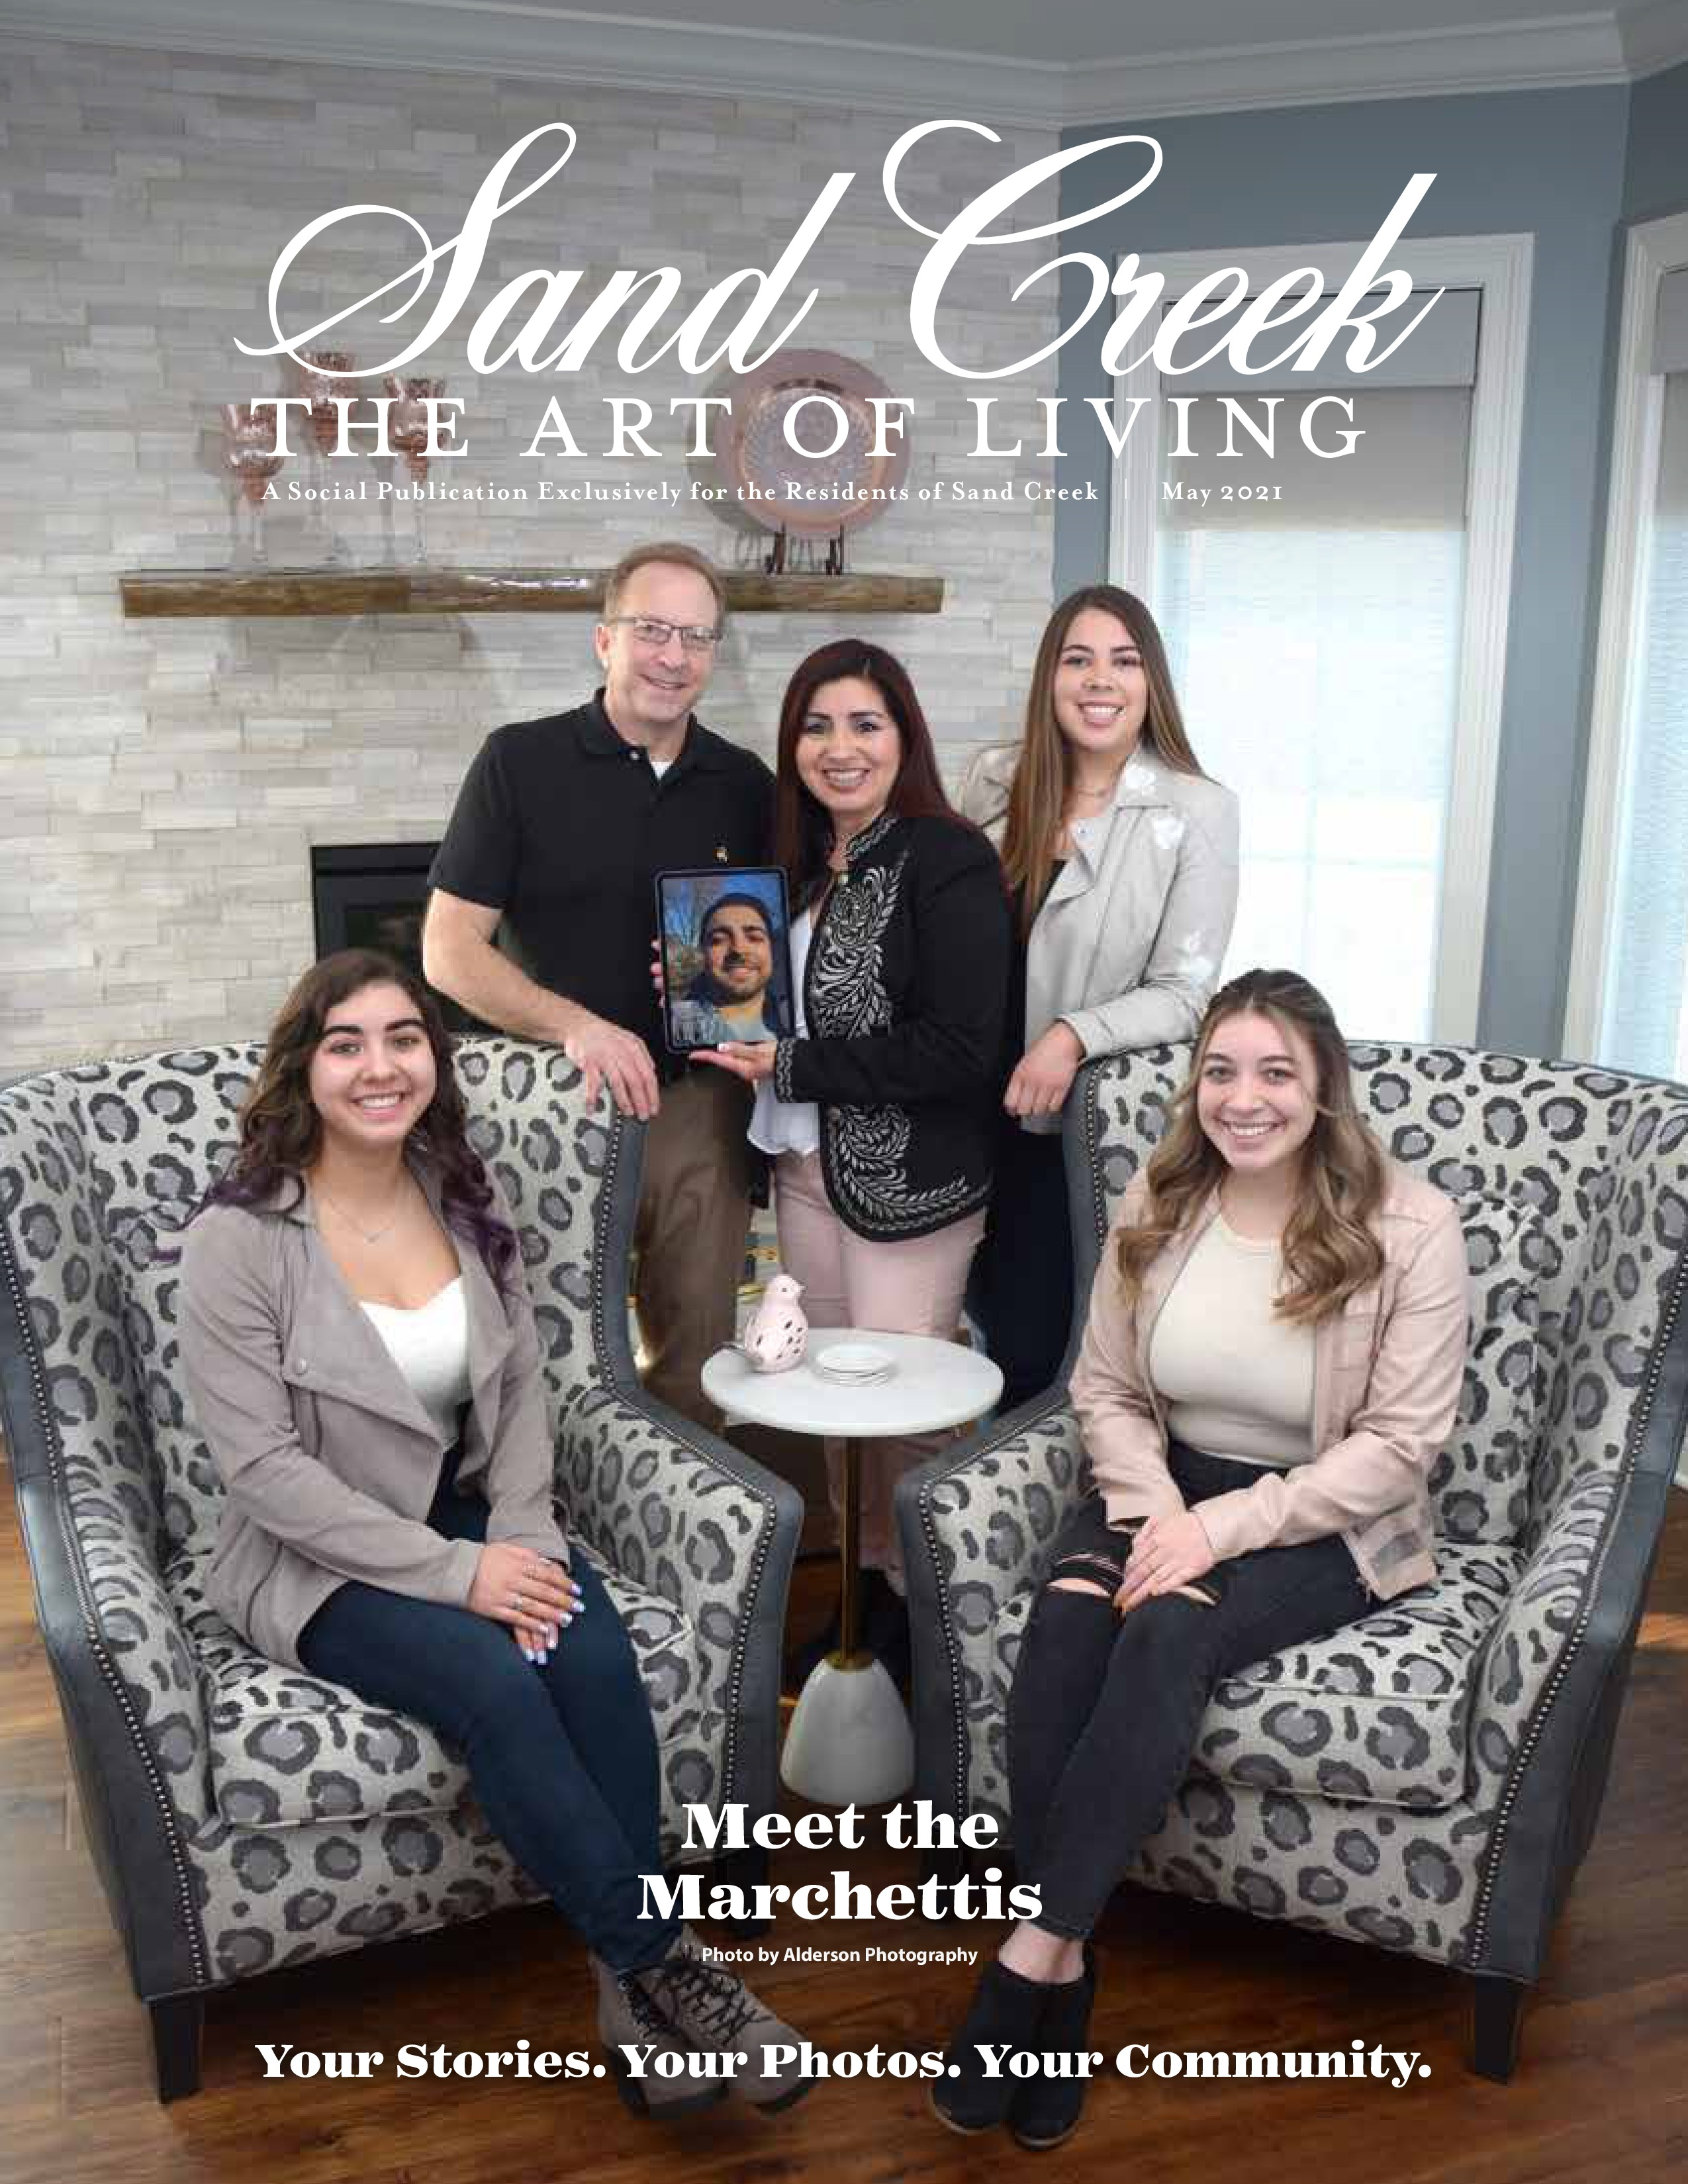 Sand Creek, The Art of Living 2021-05-01